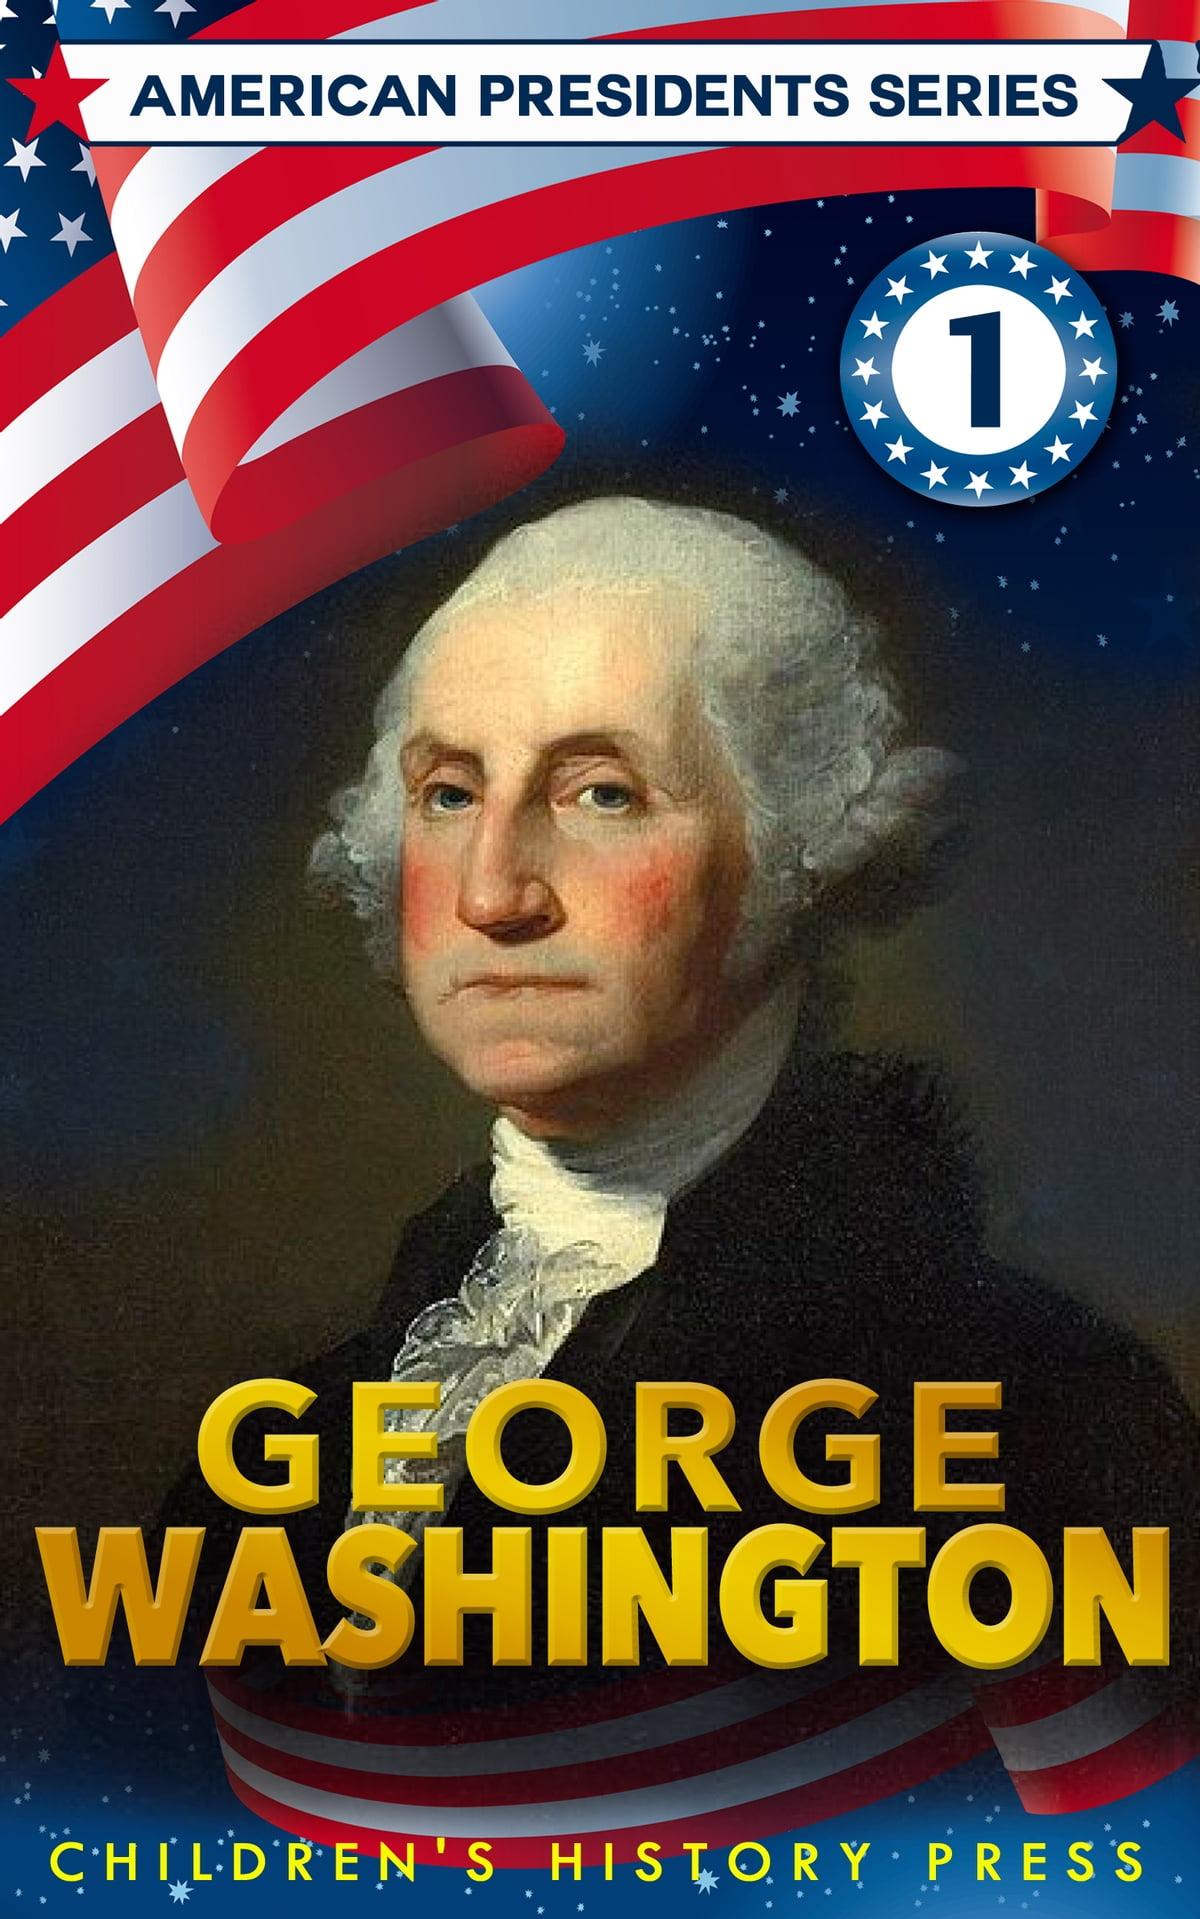 American Presidents Series George Washington For Kids